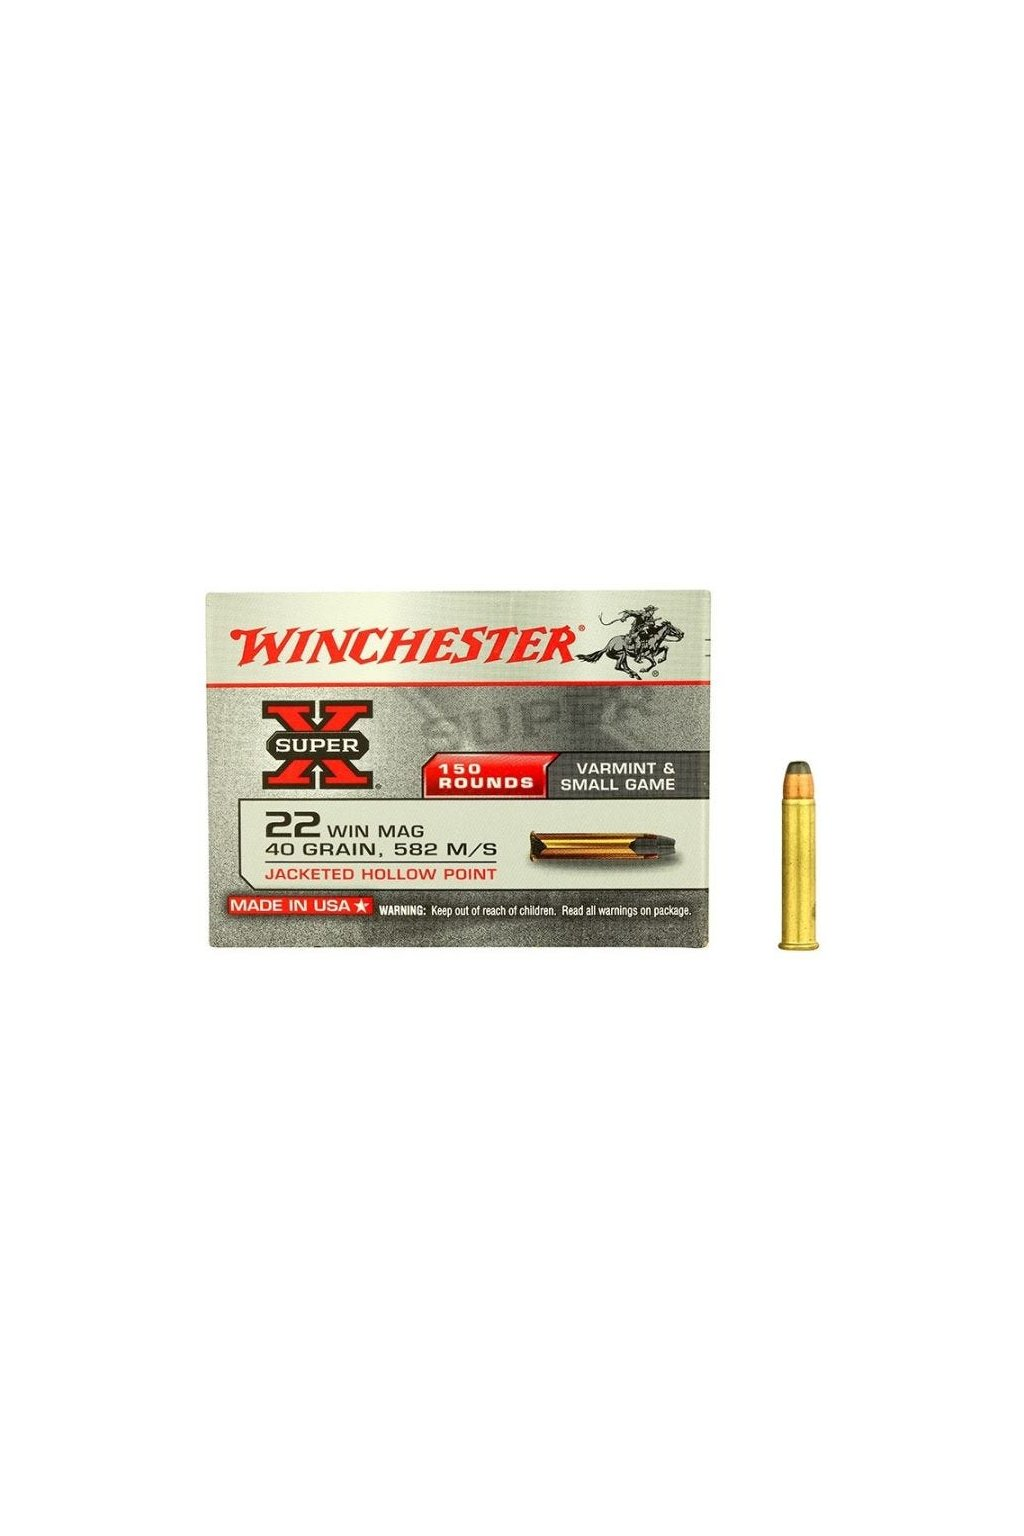 winchester super x .22 wmr jhp 40 grain